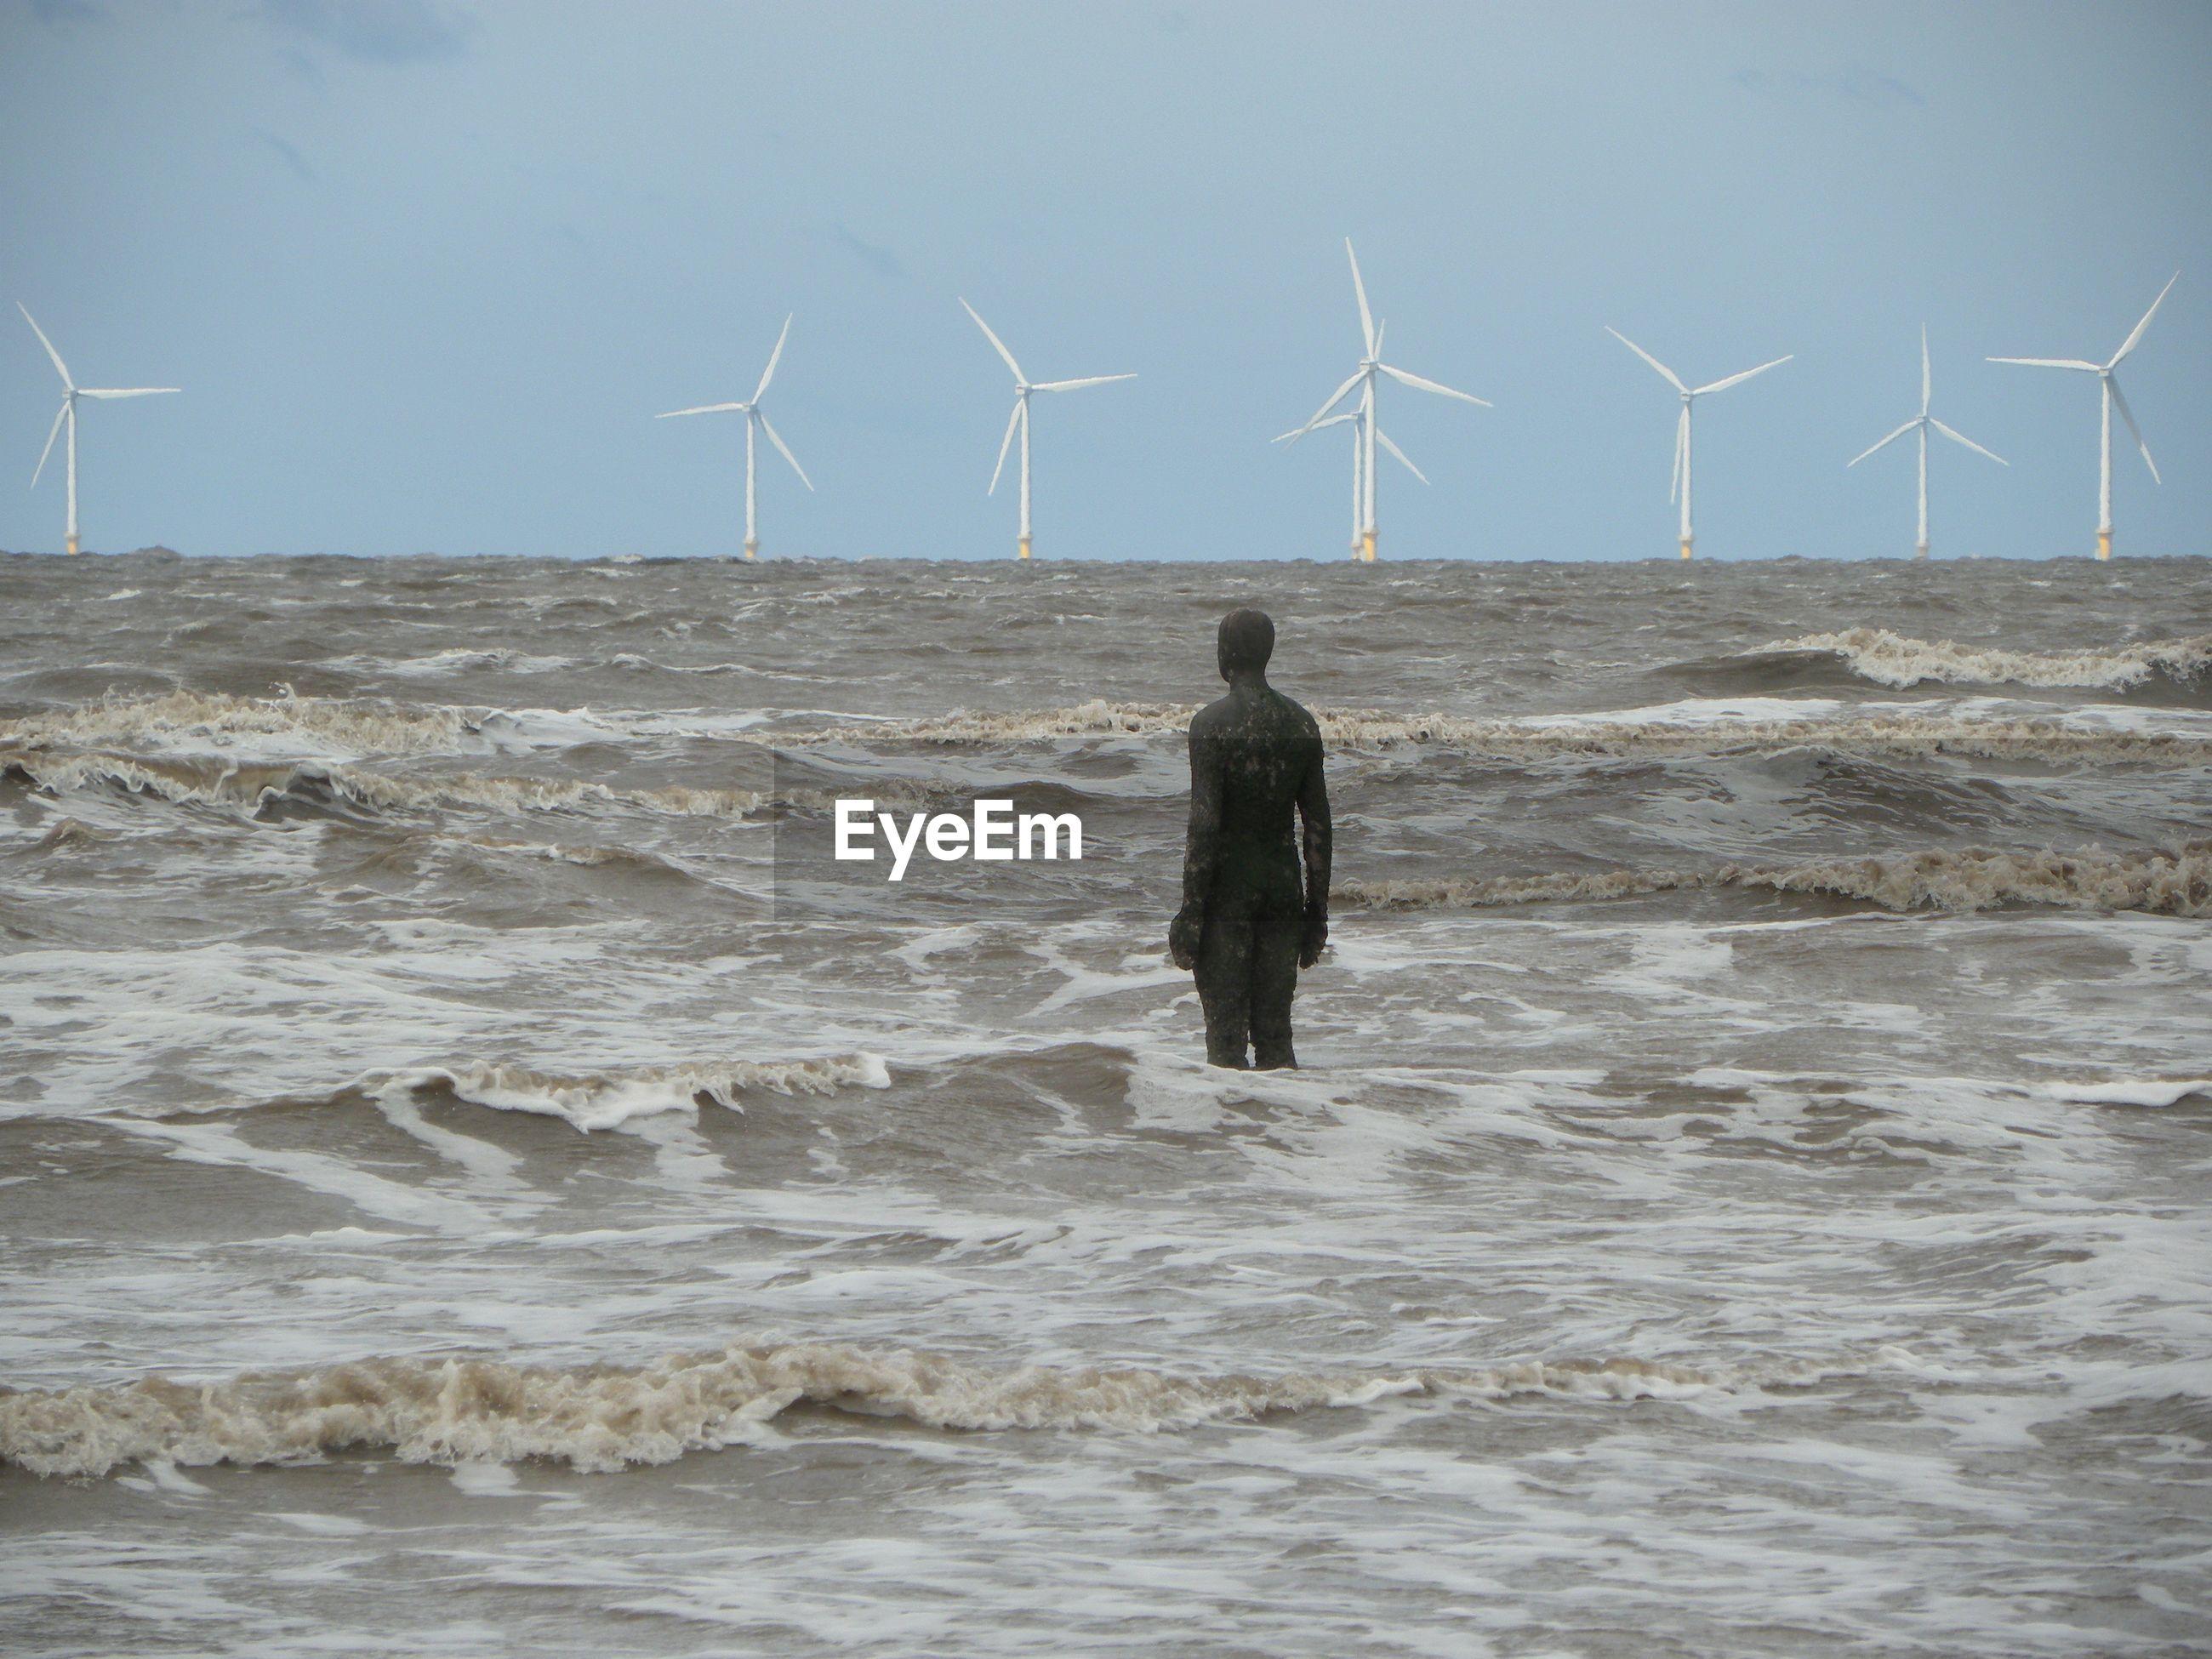 Metallic ironman in sea against wind turbines at crosby beach